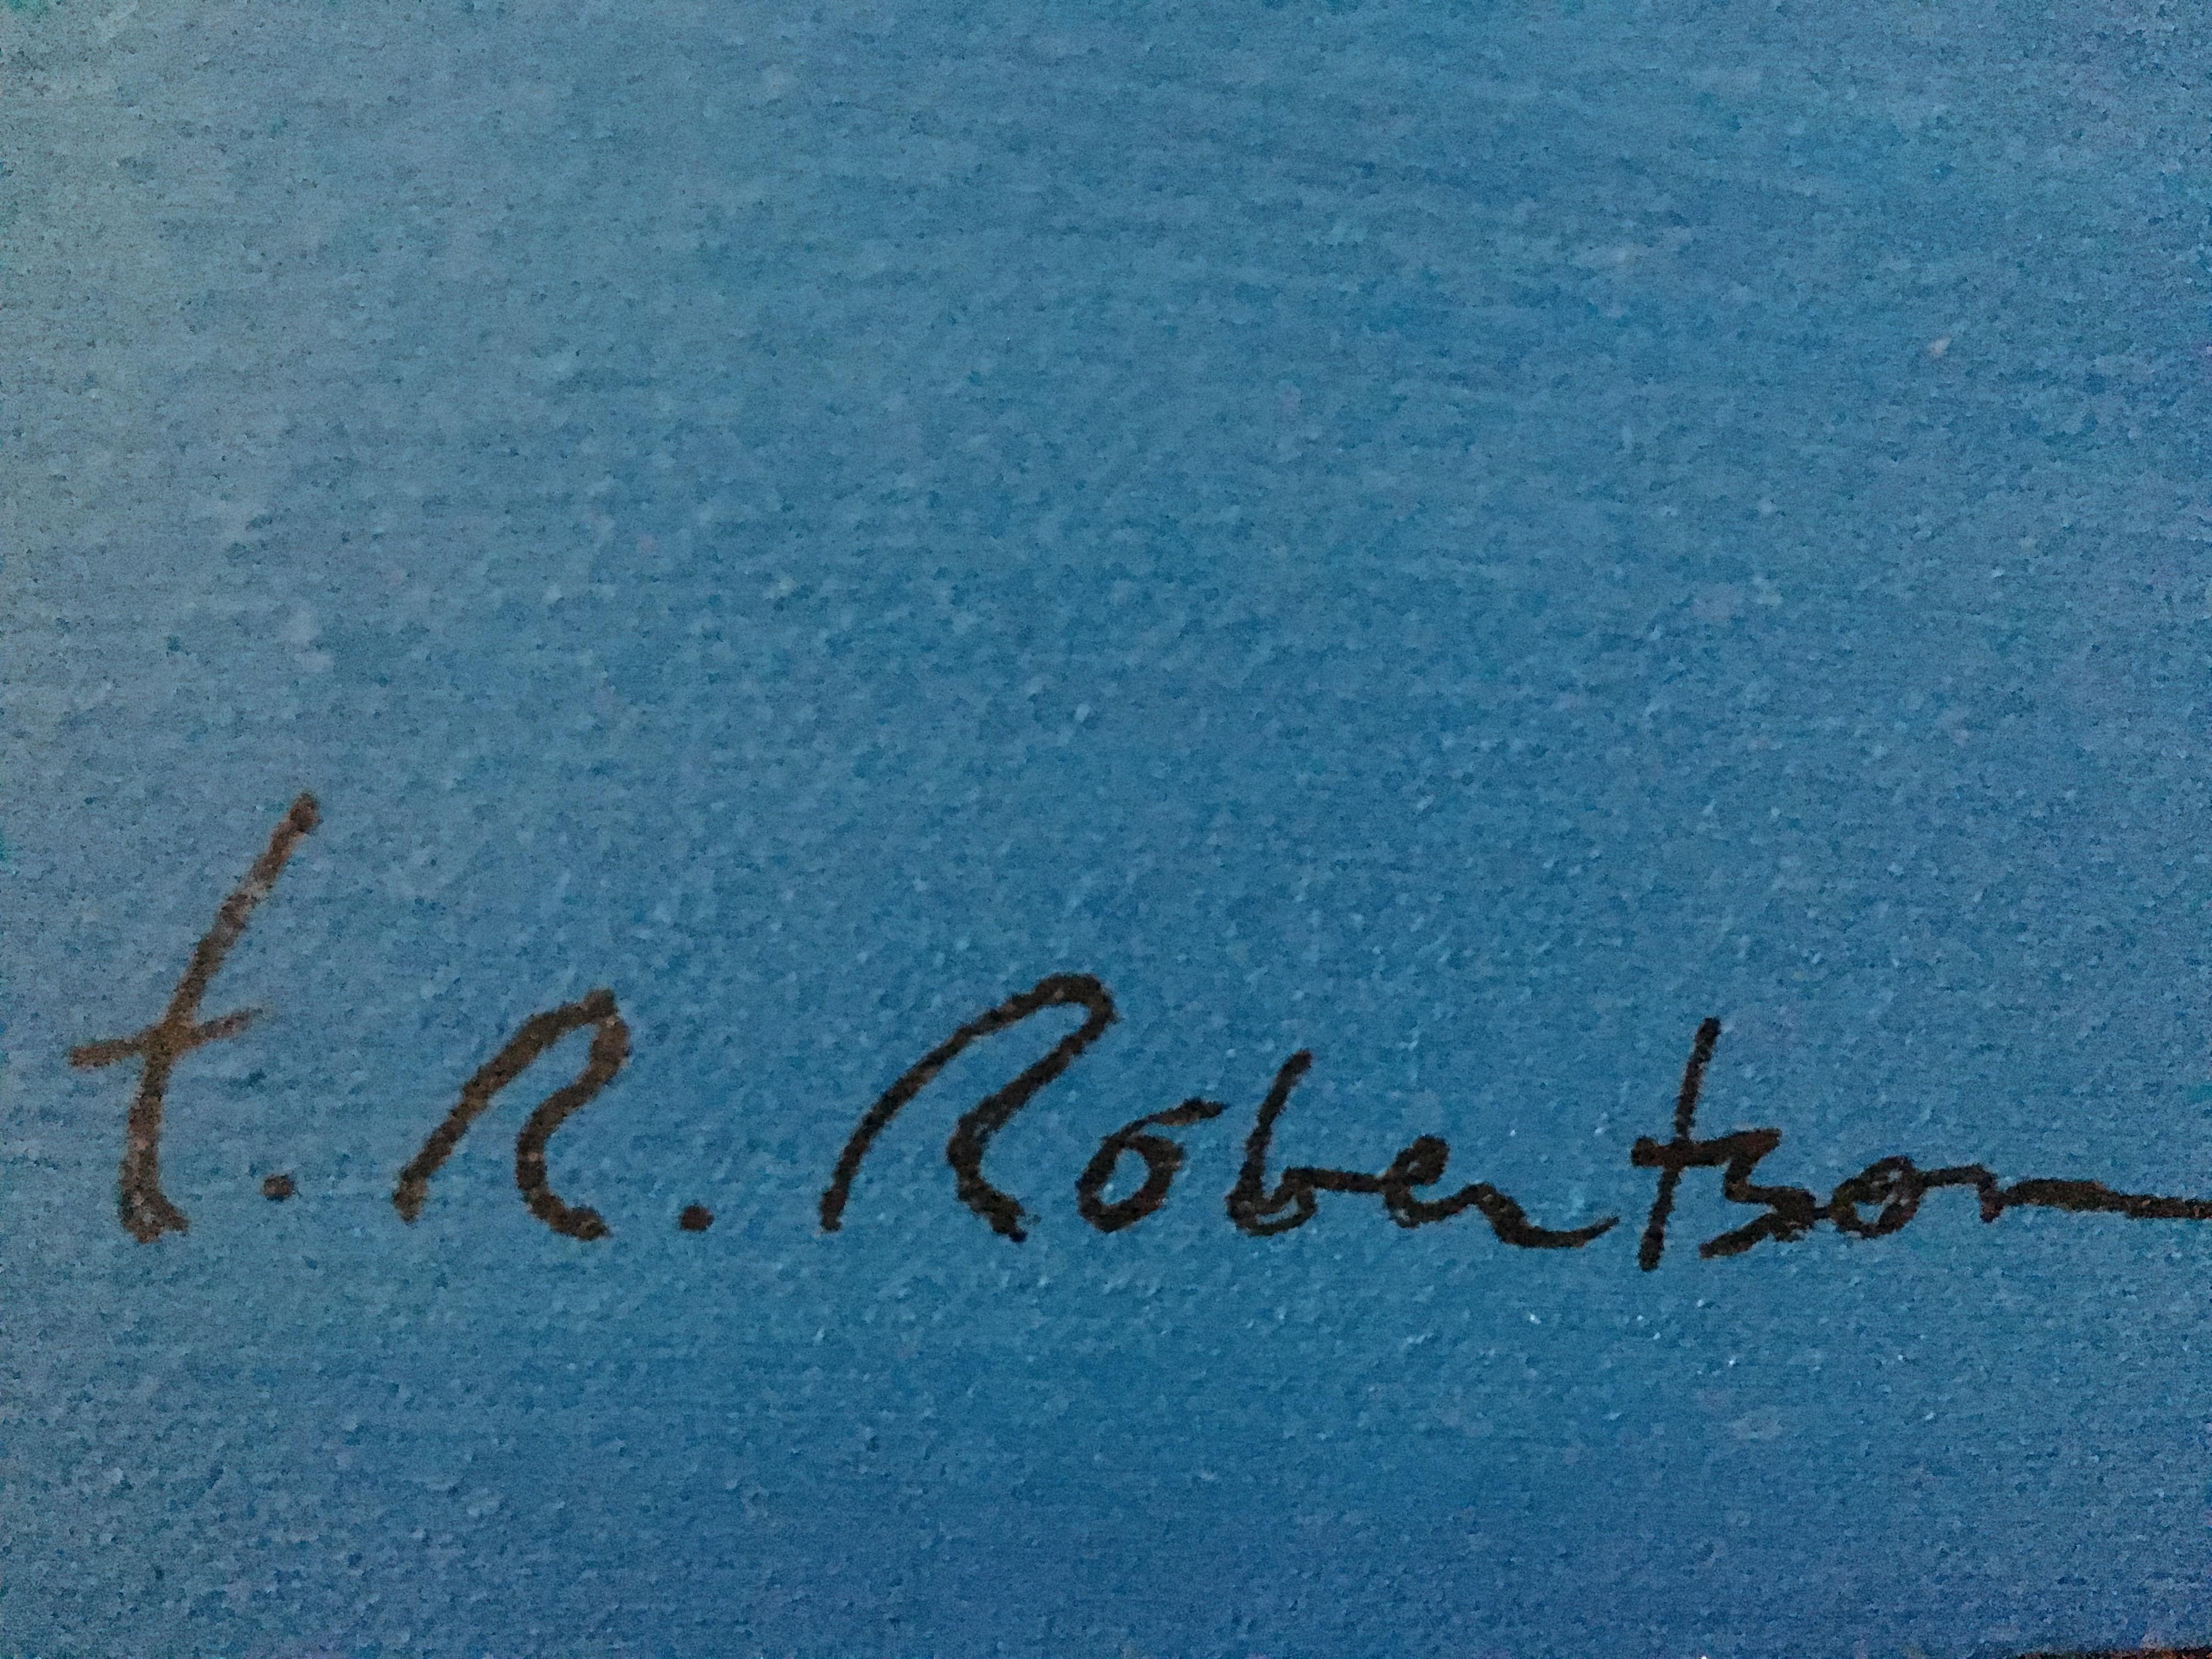 T. R. Robertson Signature